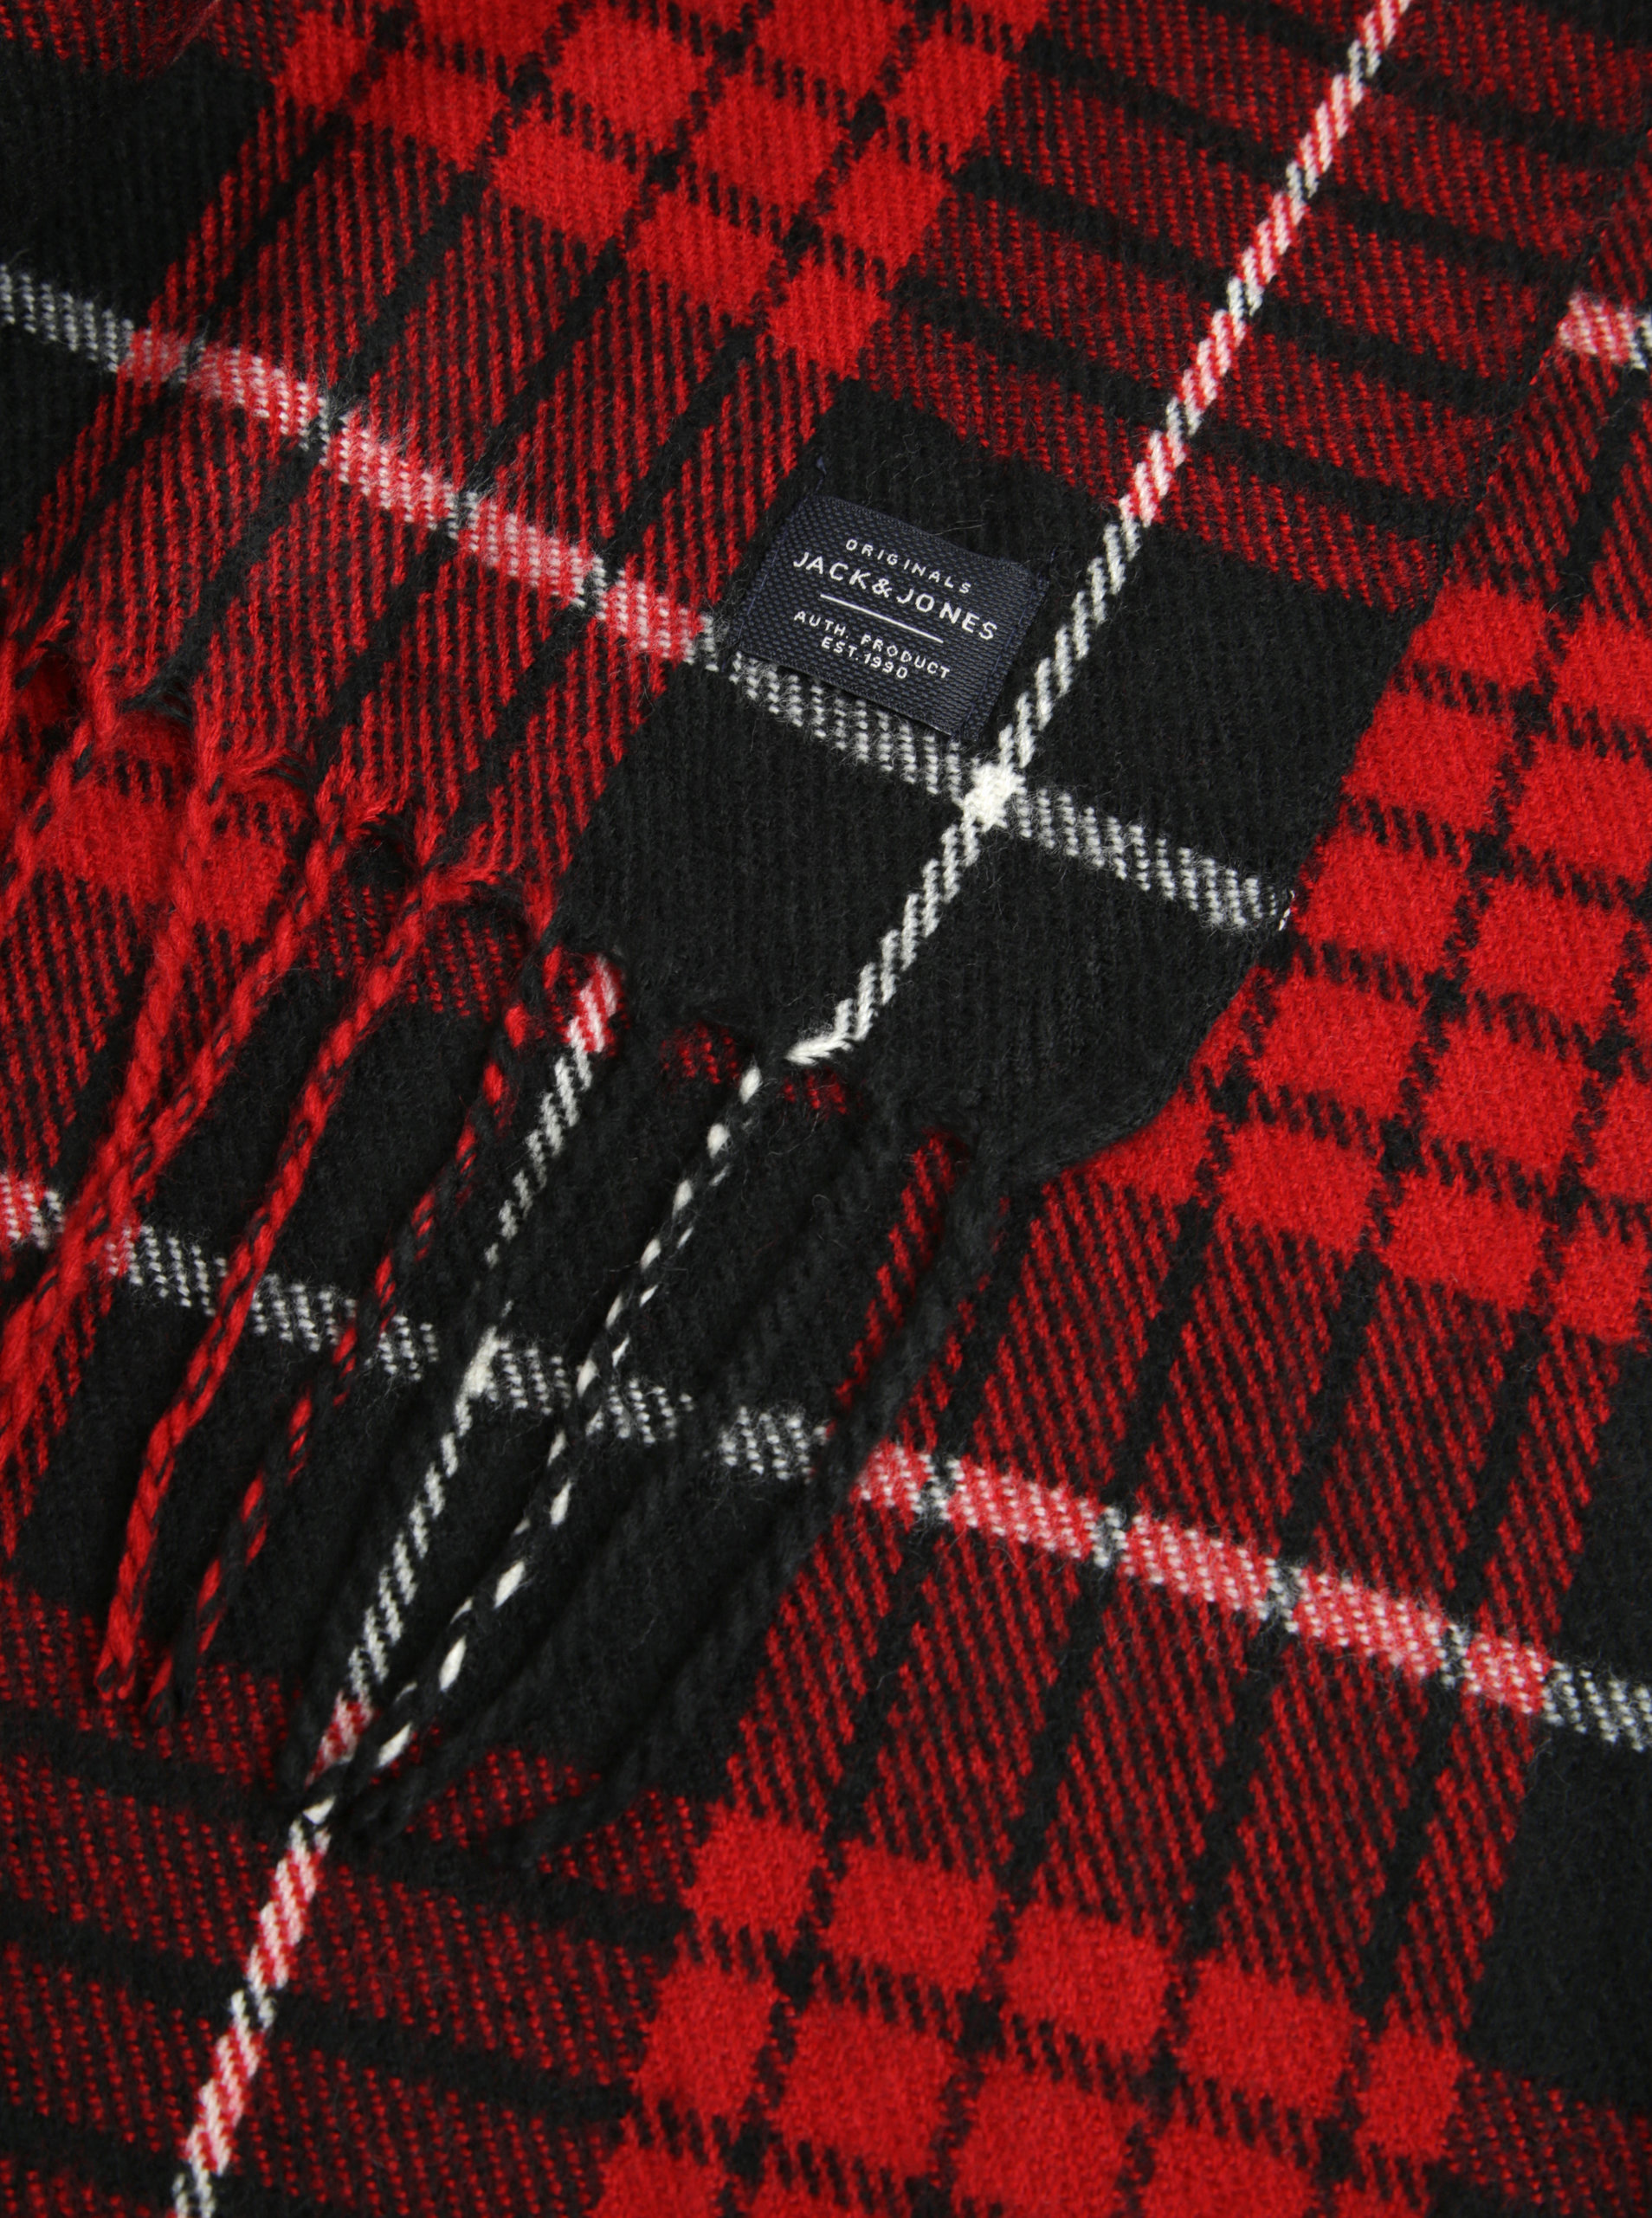 Černo-červená kostkovaná šála Jack   Jones Danny ... 272baff8cd